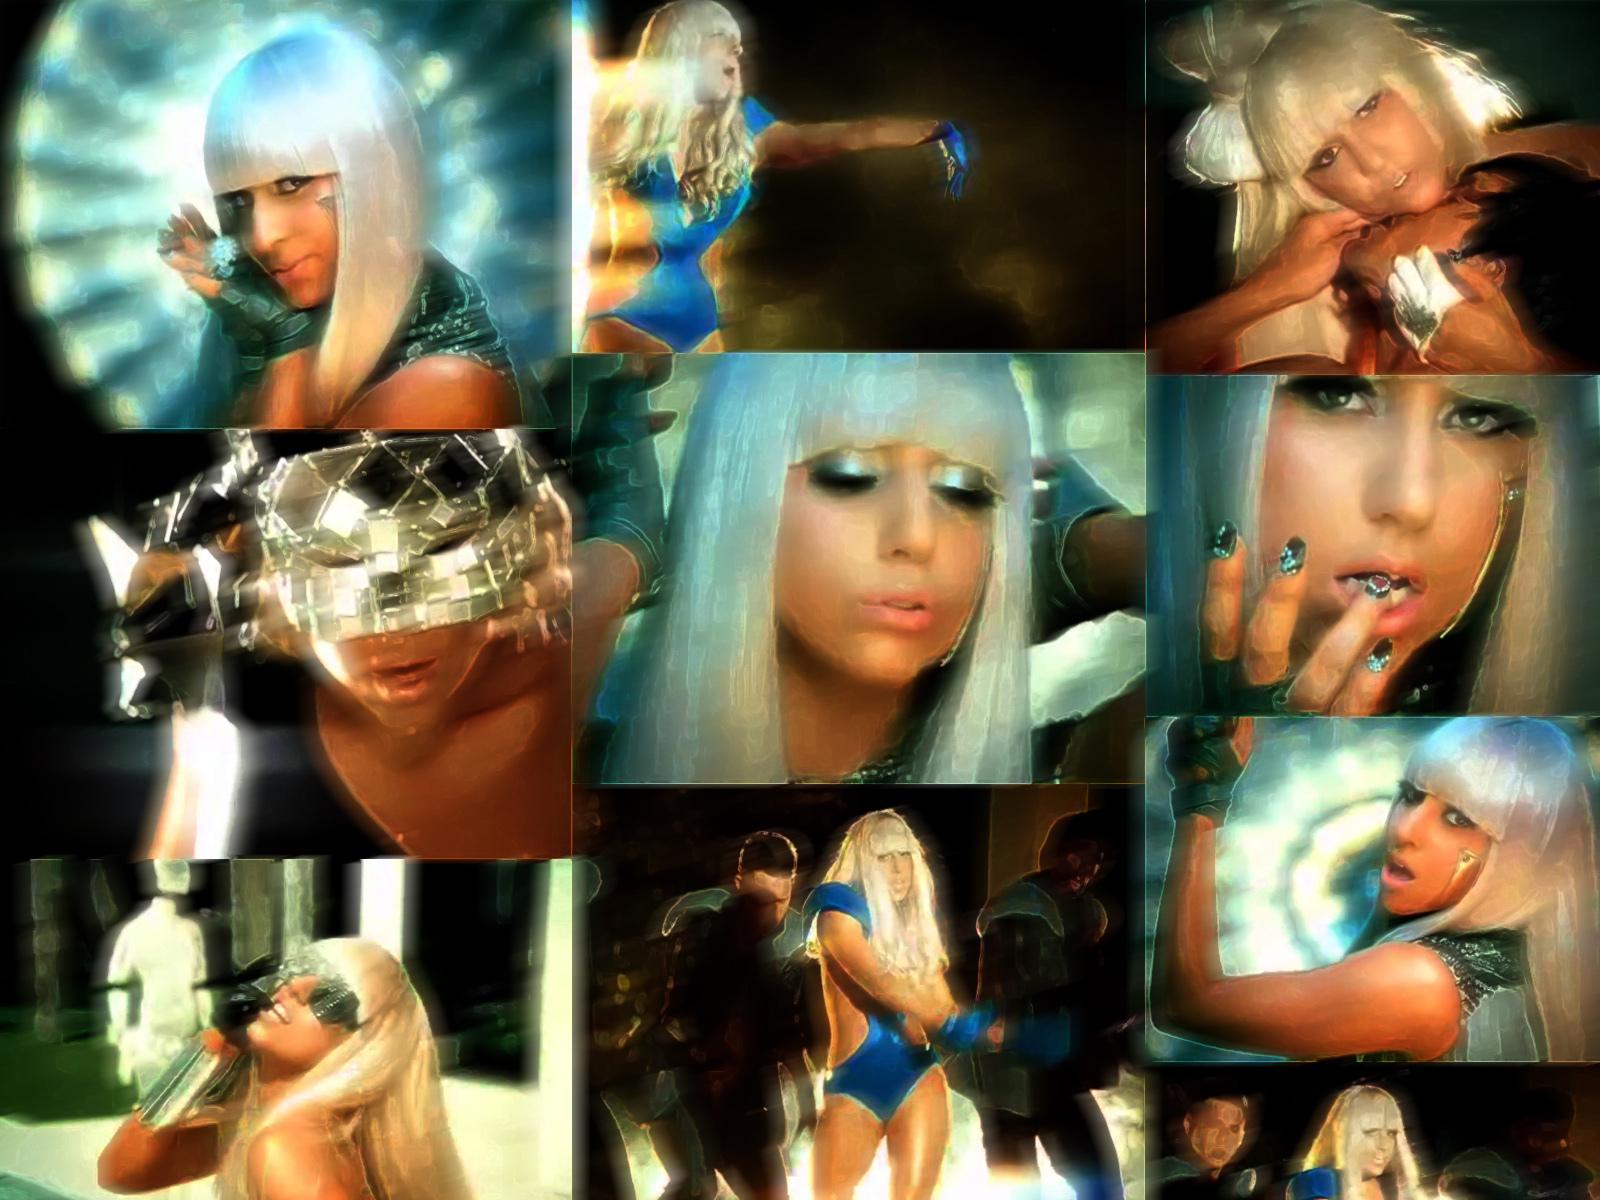 http://images2.fanpop.com/images/photos/3300000/Lady-GaGa-lady-gaga-3355926-1600-1200.jpg